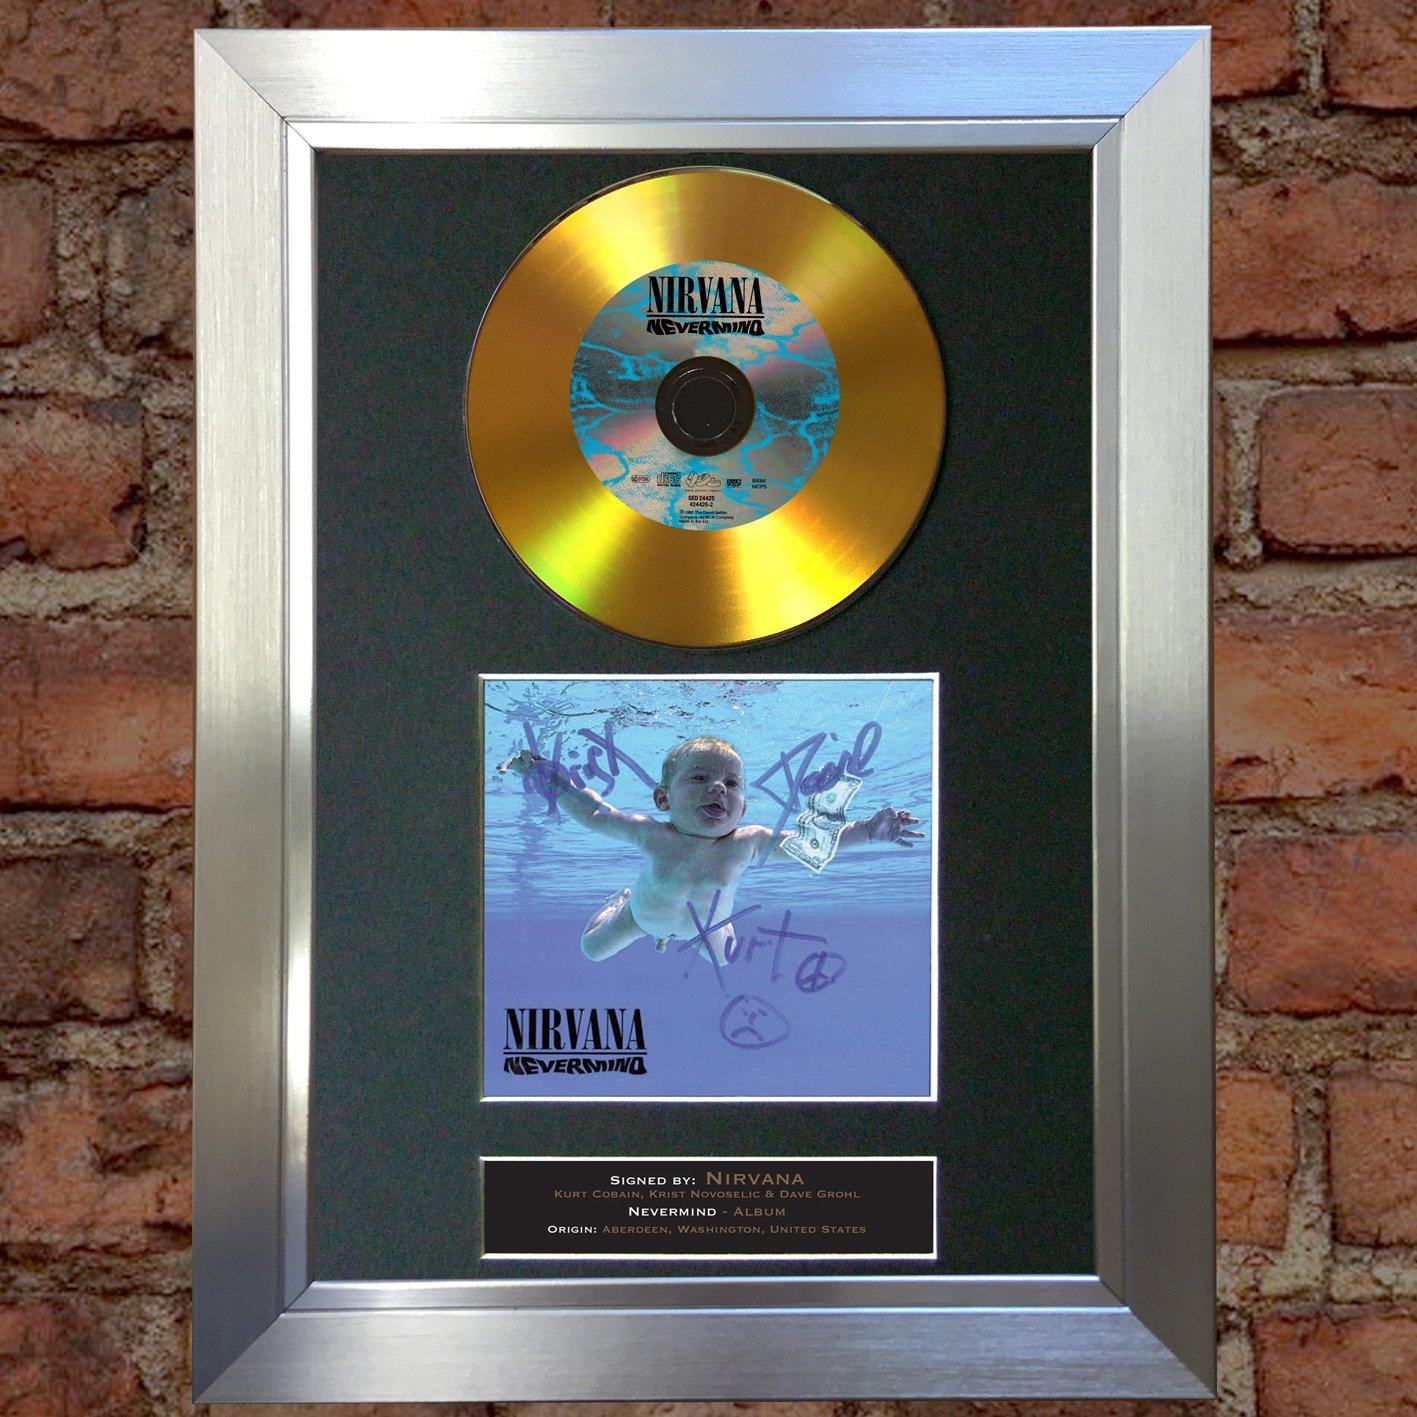 Amazon.de: The Autograph Collector 81 Gold Disc Nirvana Nevermind ...